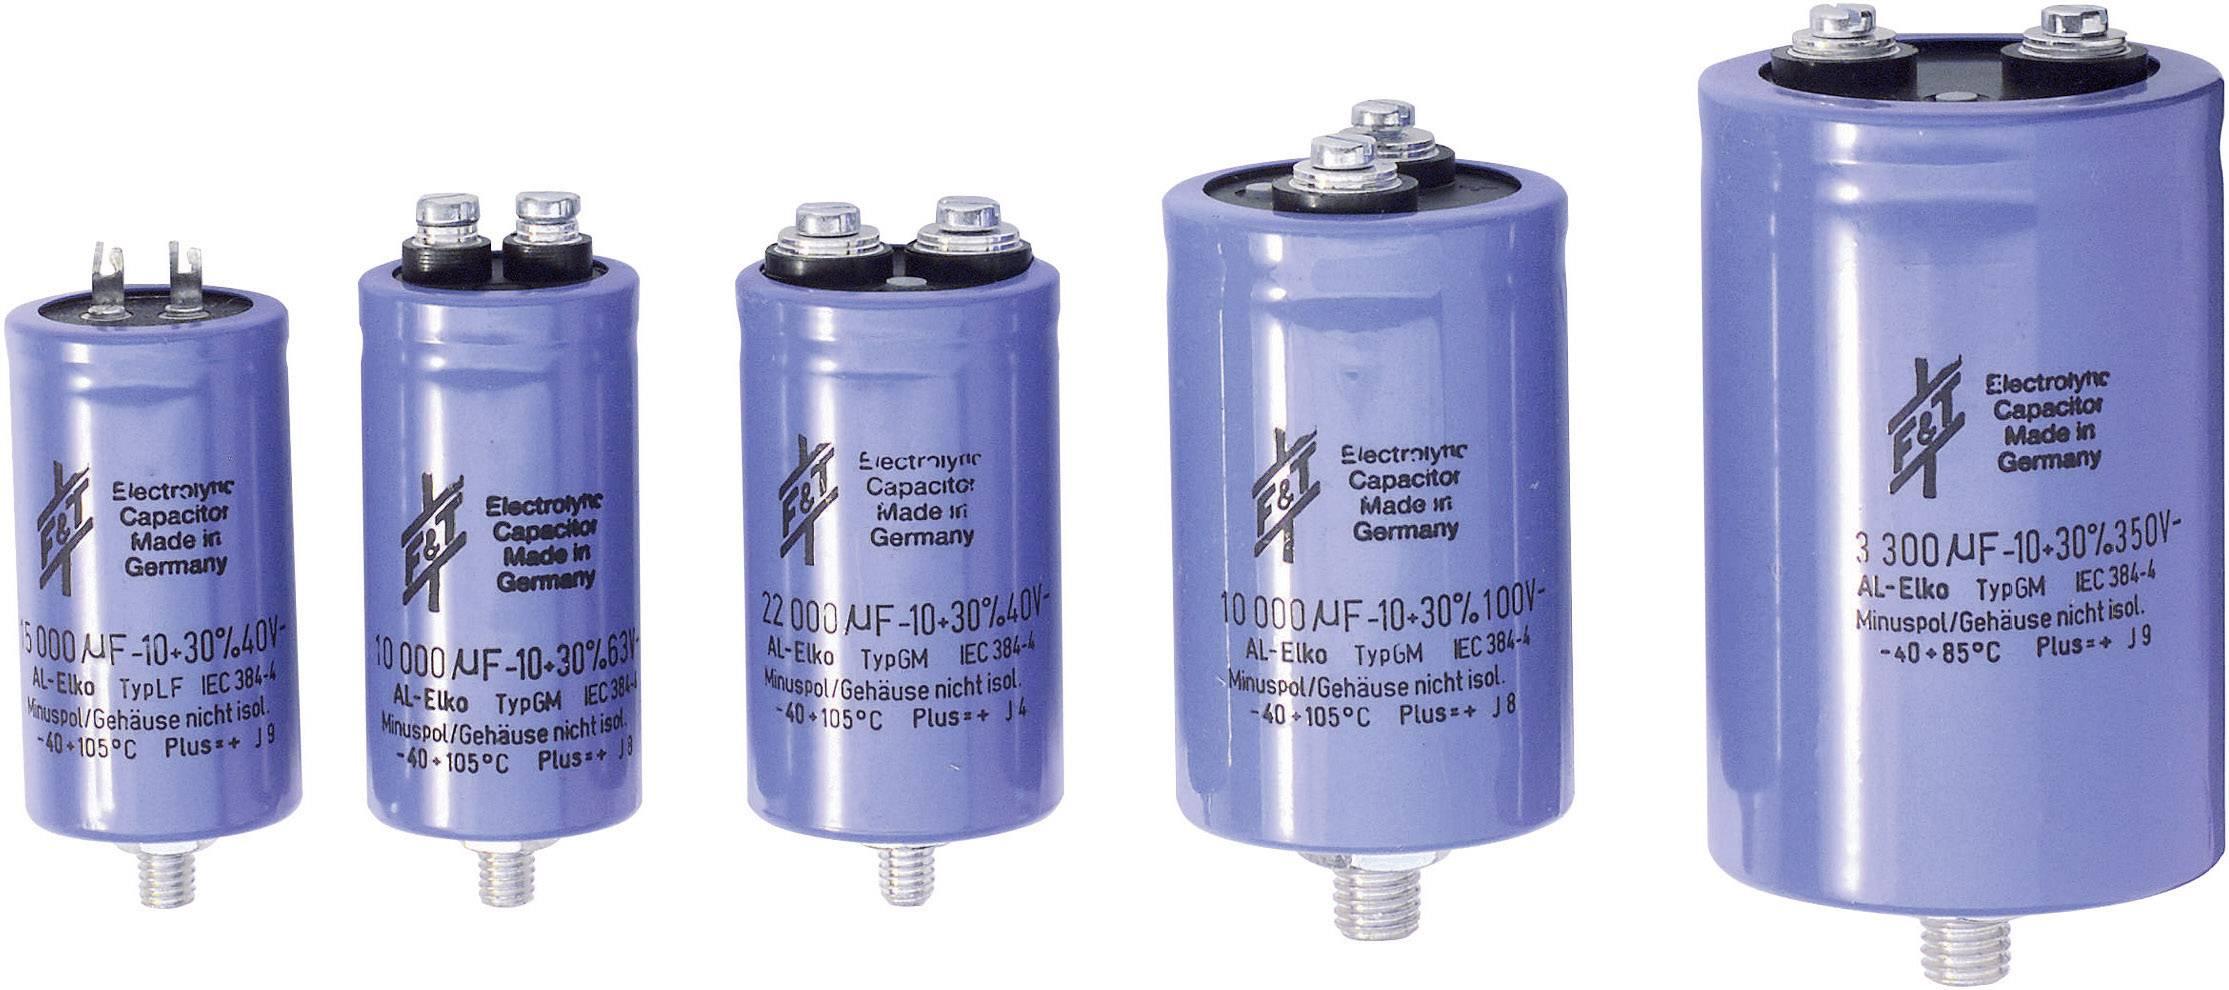 10 Stück Elko 680 µF 50V Kondensator 12x 30mm 105°